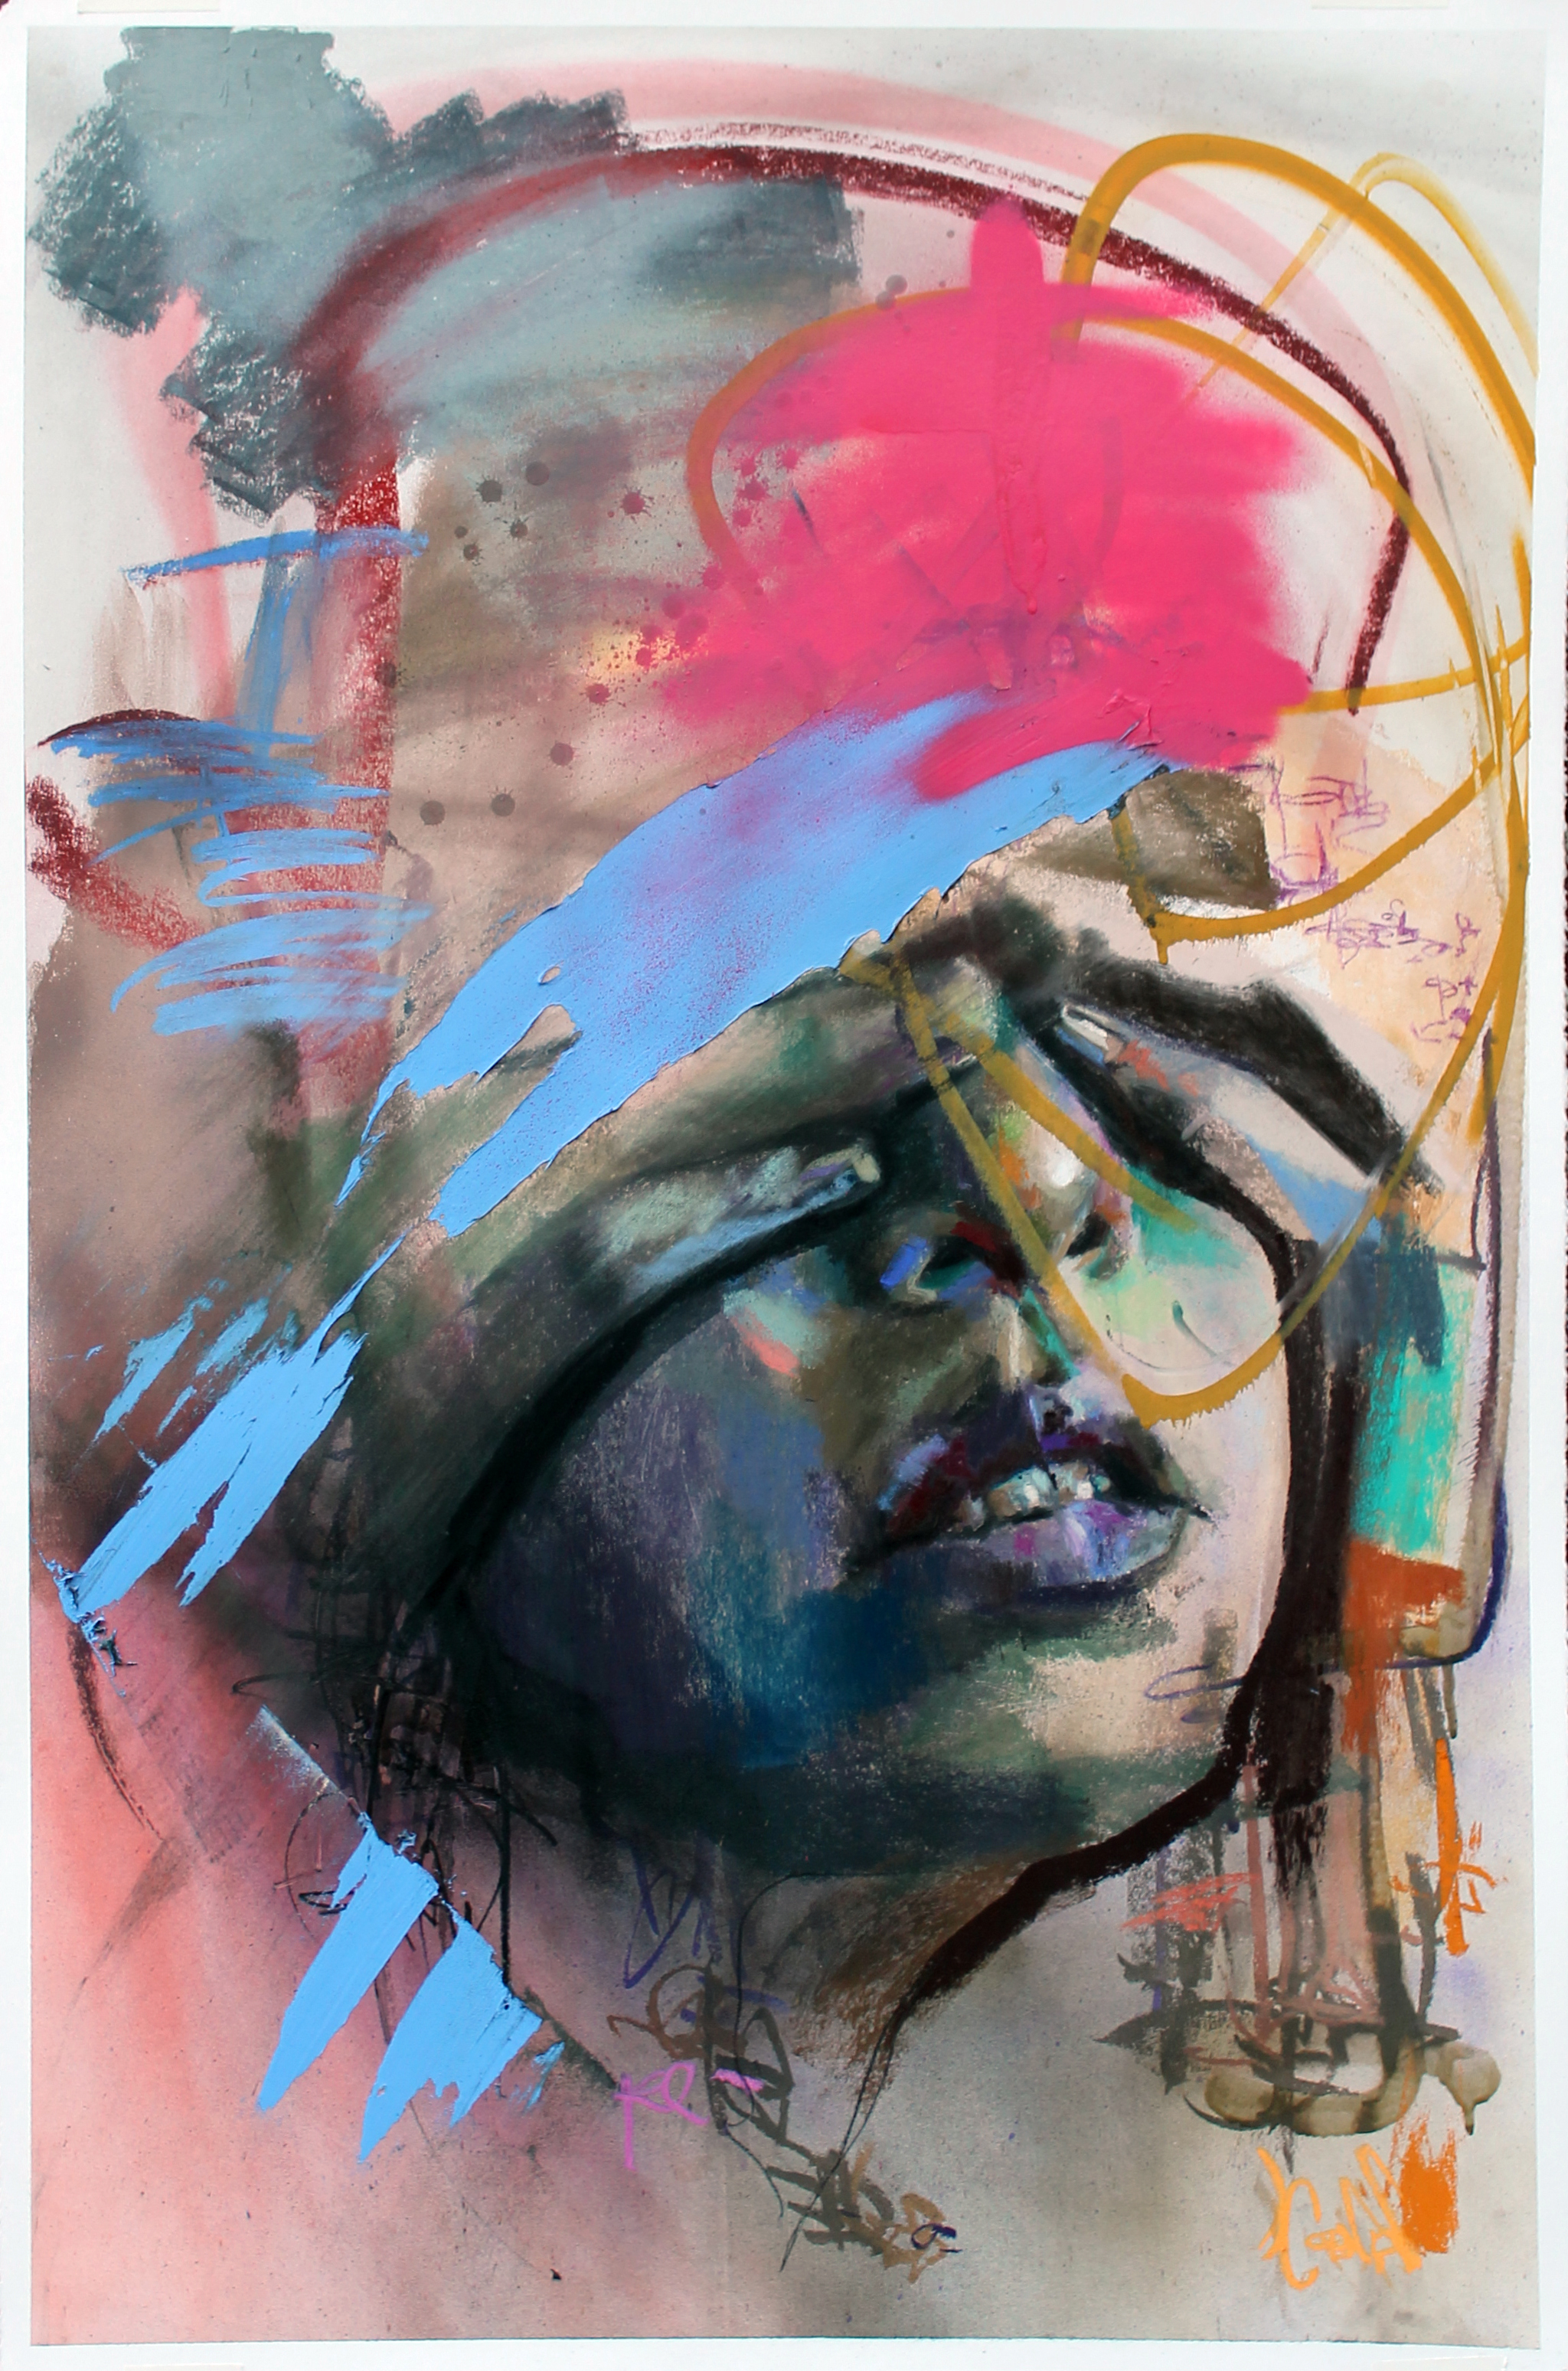 Pastel, Spray Paint, and Acrylic on Stonehenge Paper  40 x 26, 2016